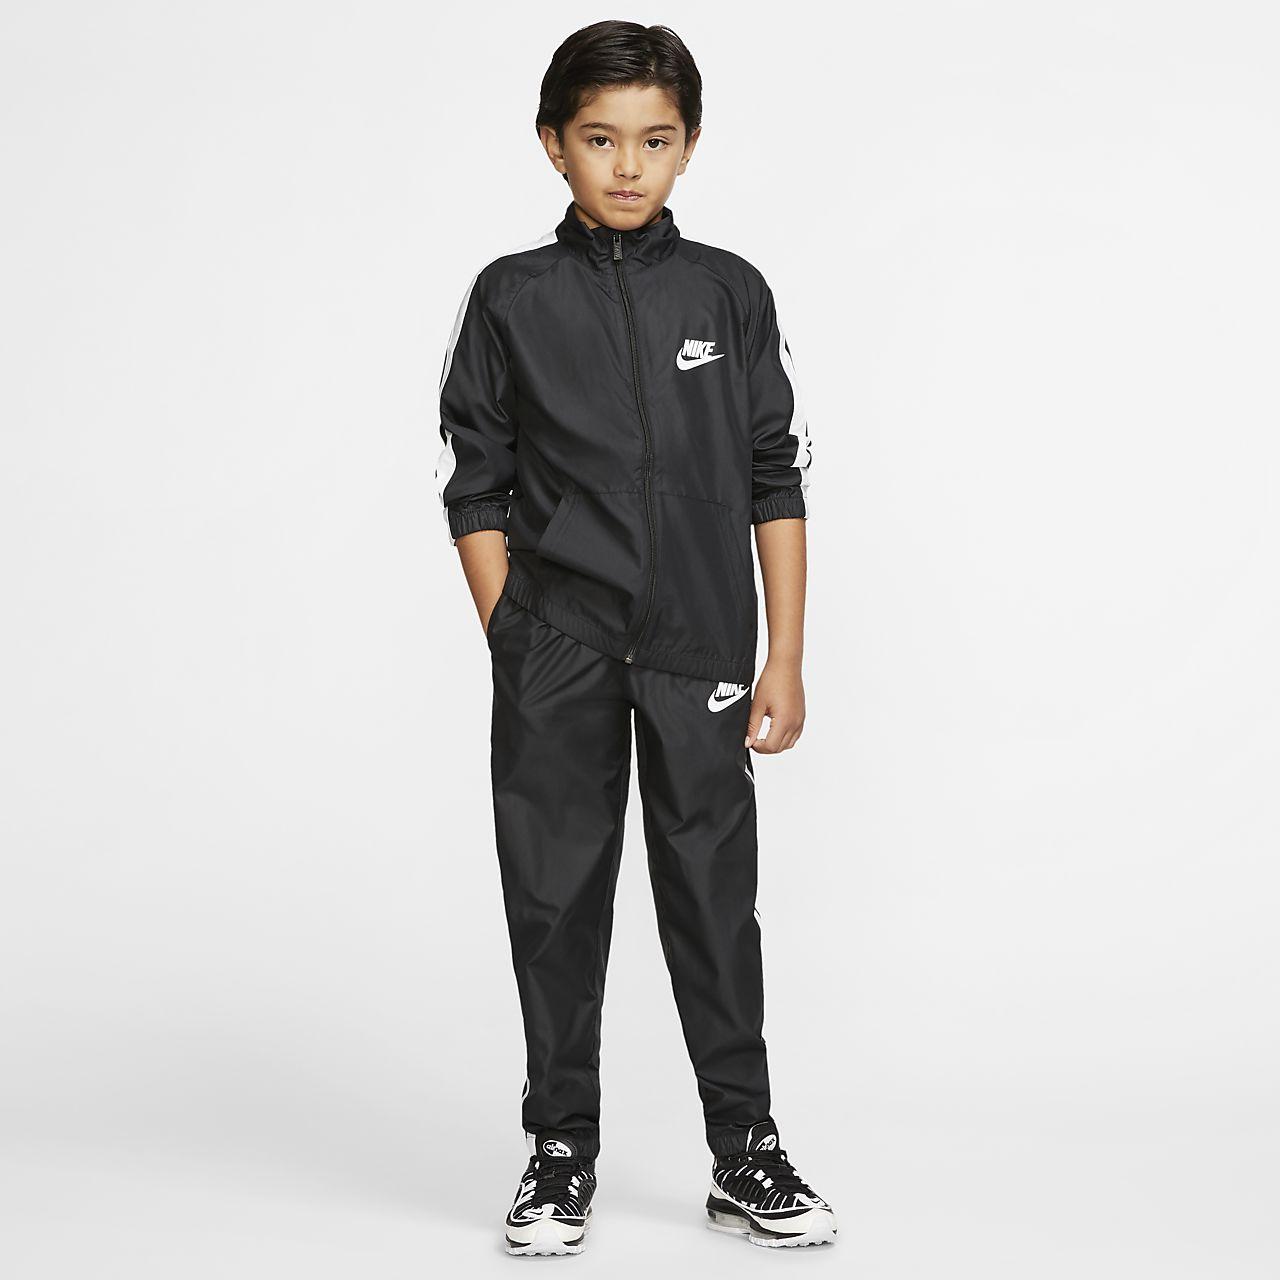 cc025d5c6 Nike Sportswear Older Kids  Woven Tracksuit. Nike.com BE